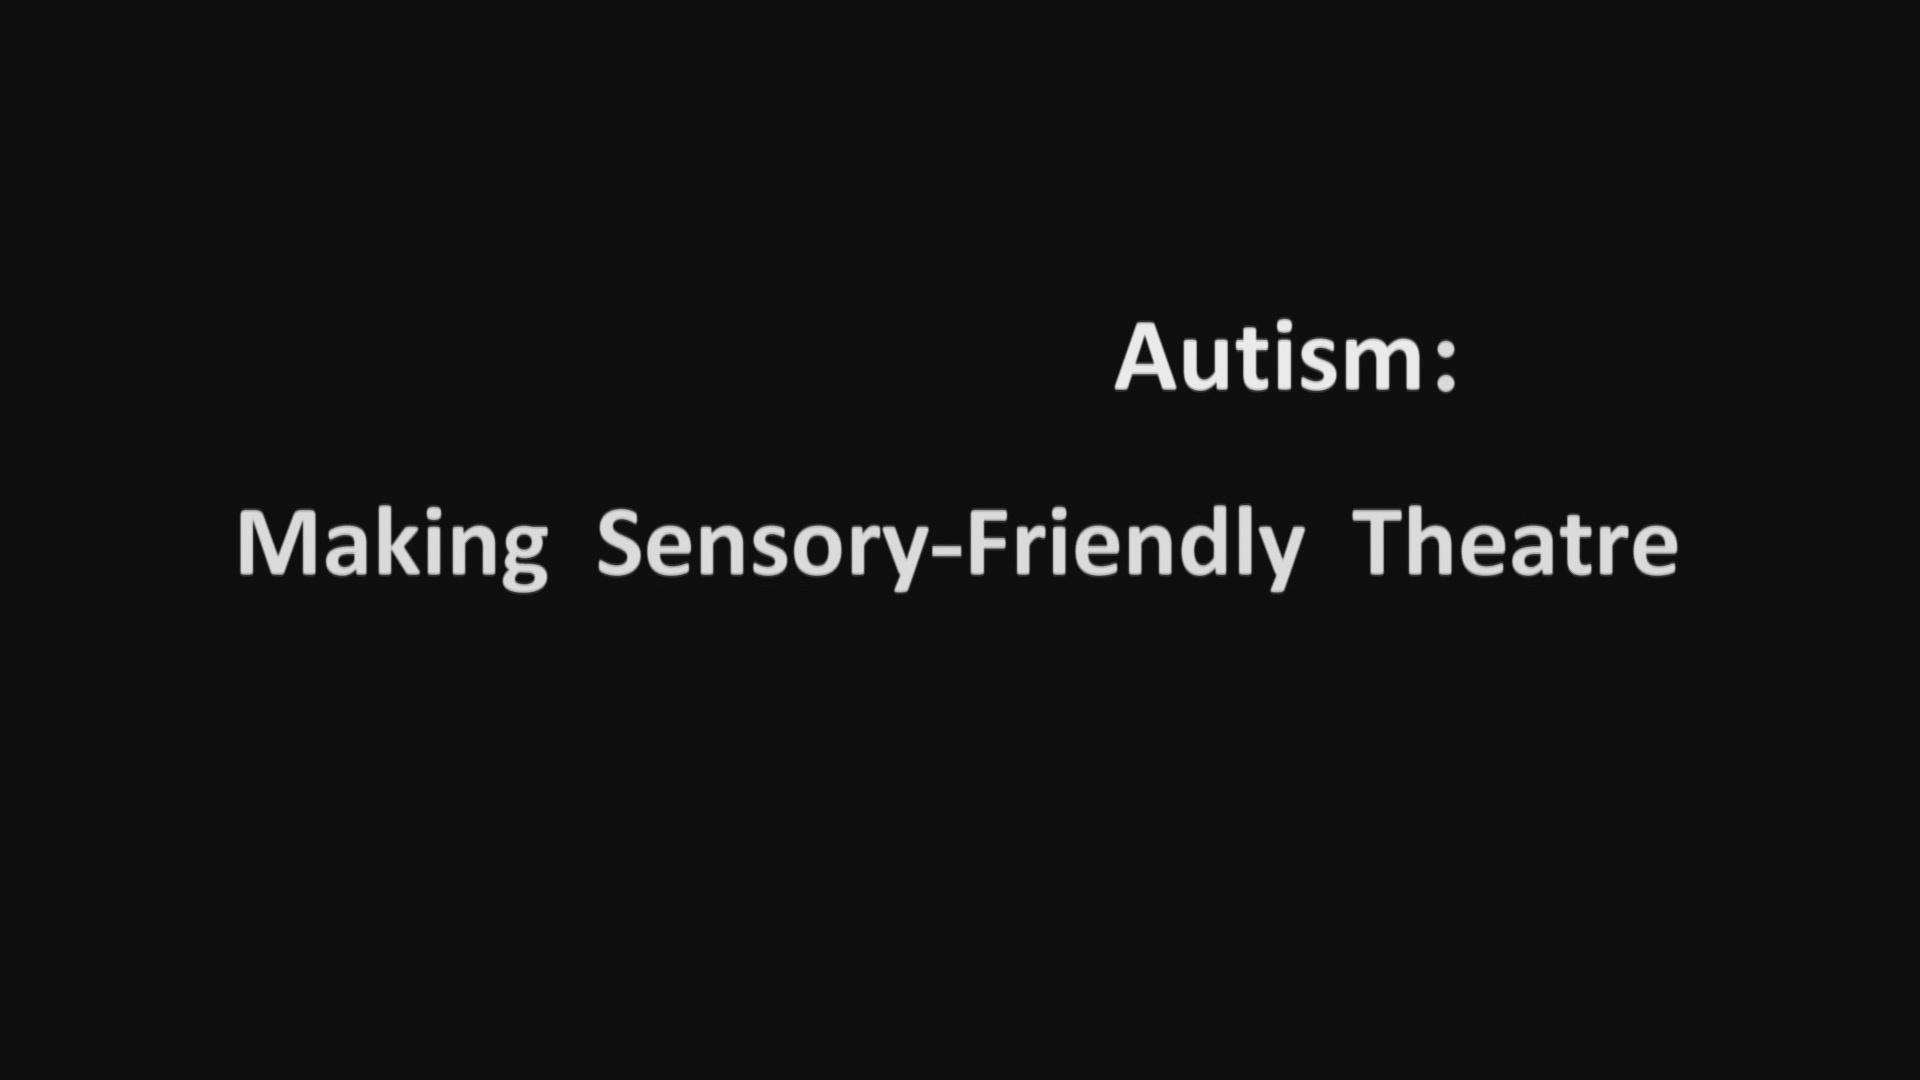 Making Theater Autism Friendly >> Autism Making Sensory Friendly Theatre Oeta Presents Pbs